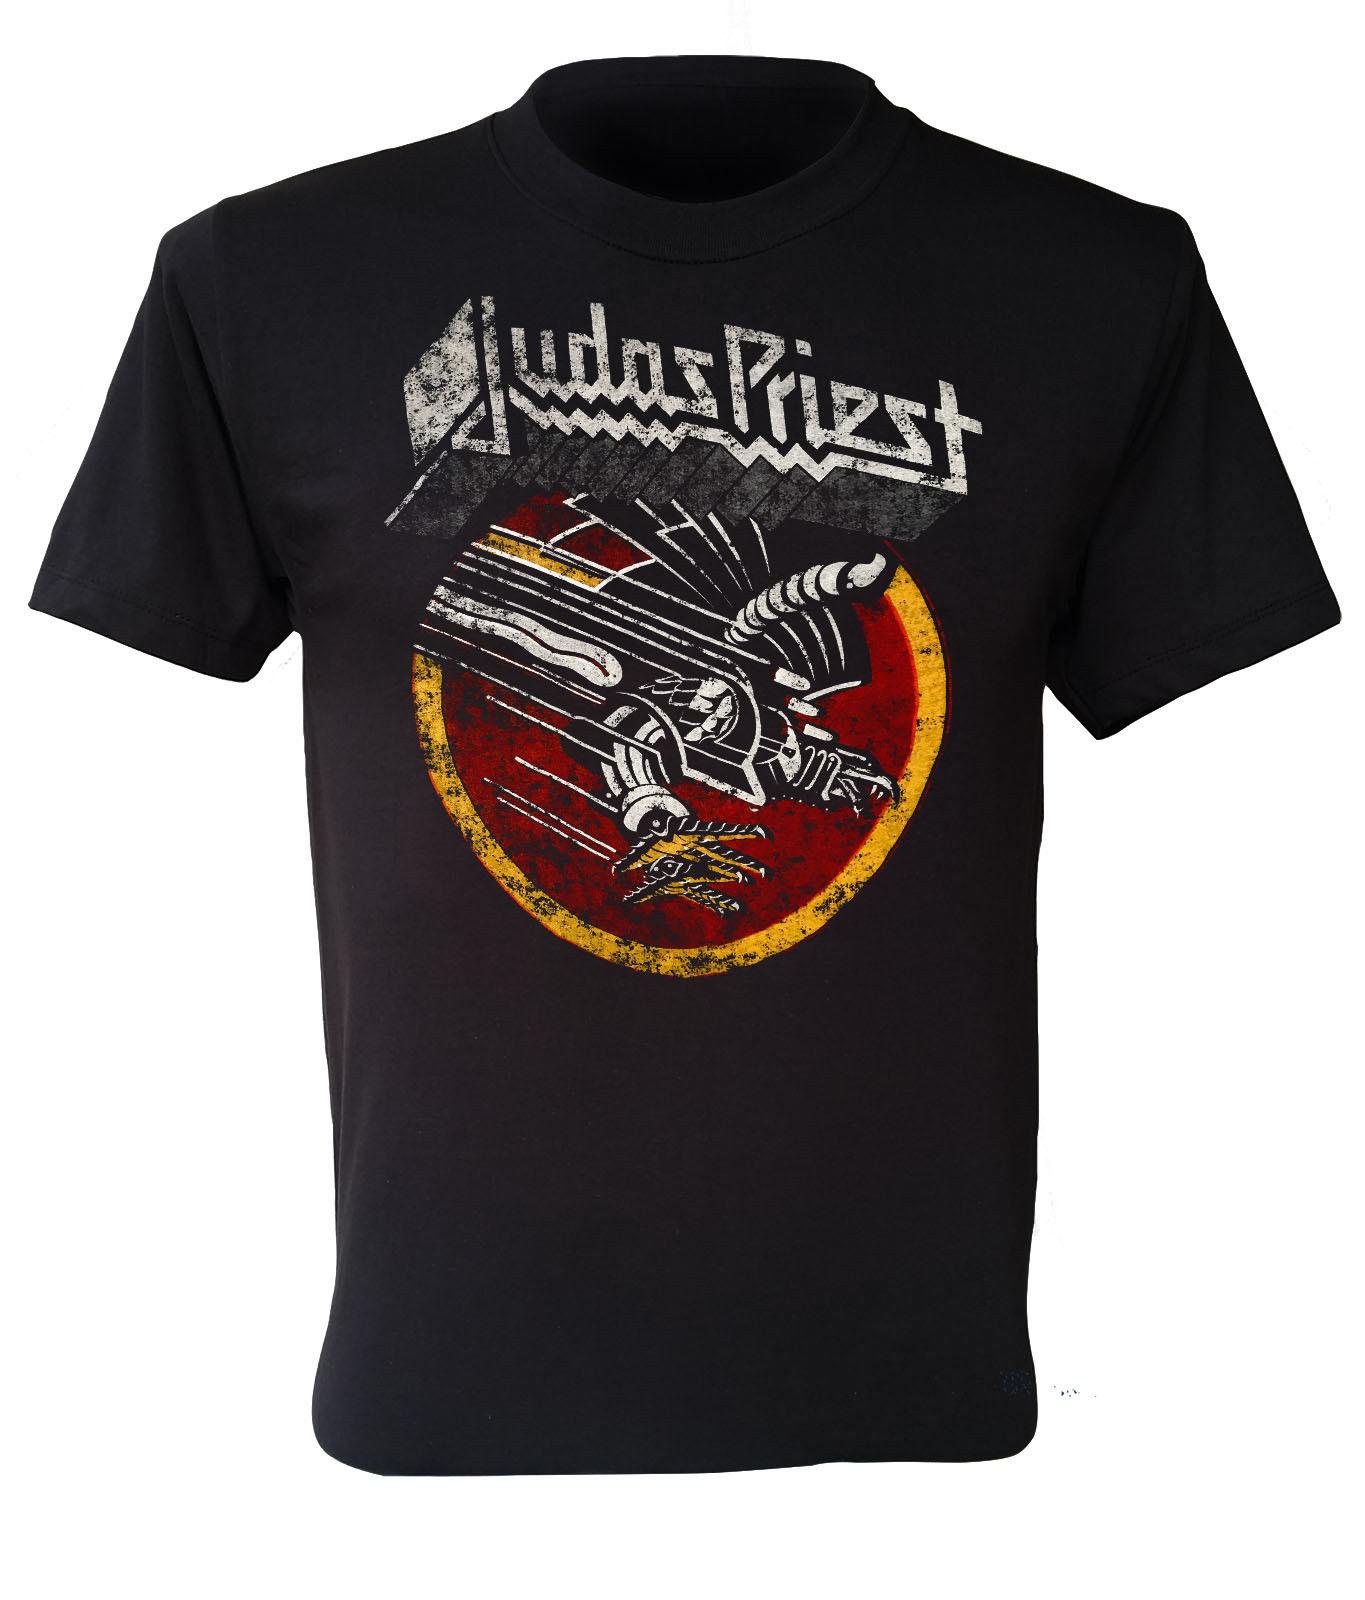 JustinLSullivan Judas Priest T Shirt Youth Shirt Boys Teenager Round Neck Short Sleeve Tee